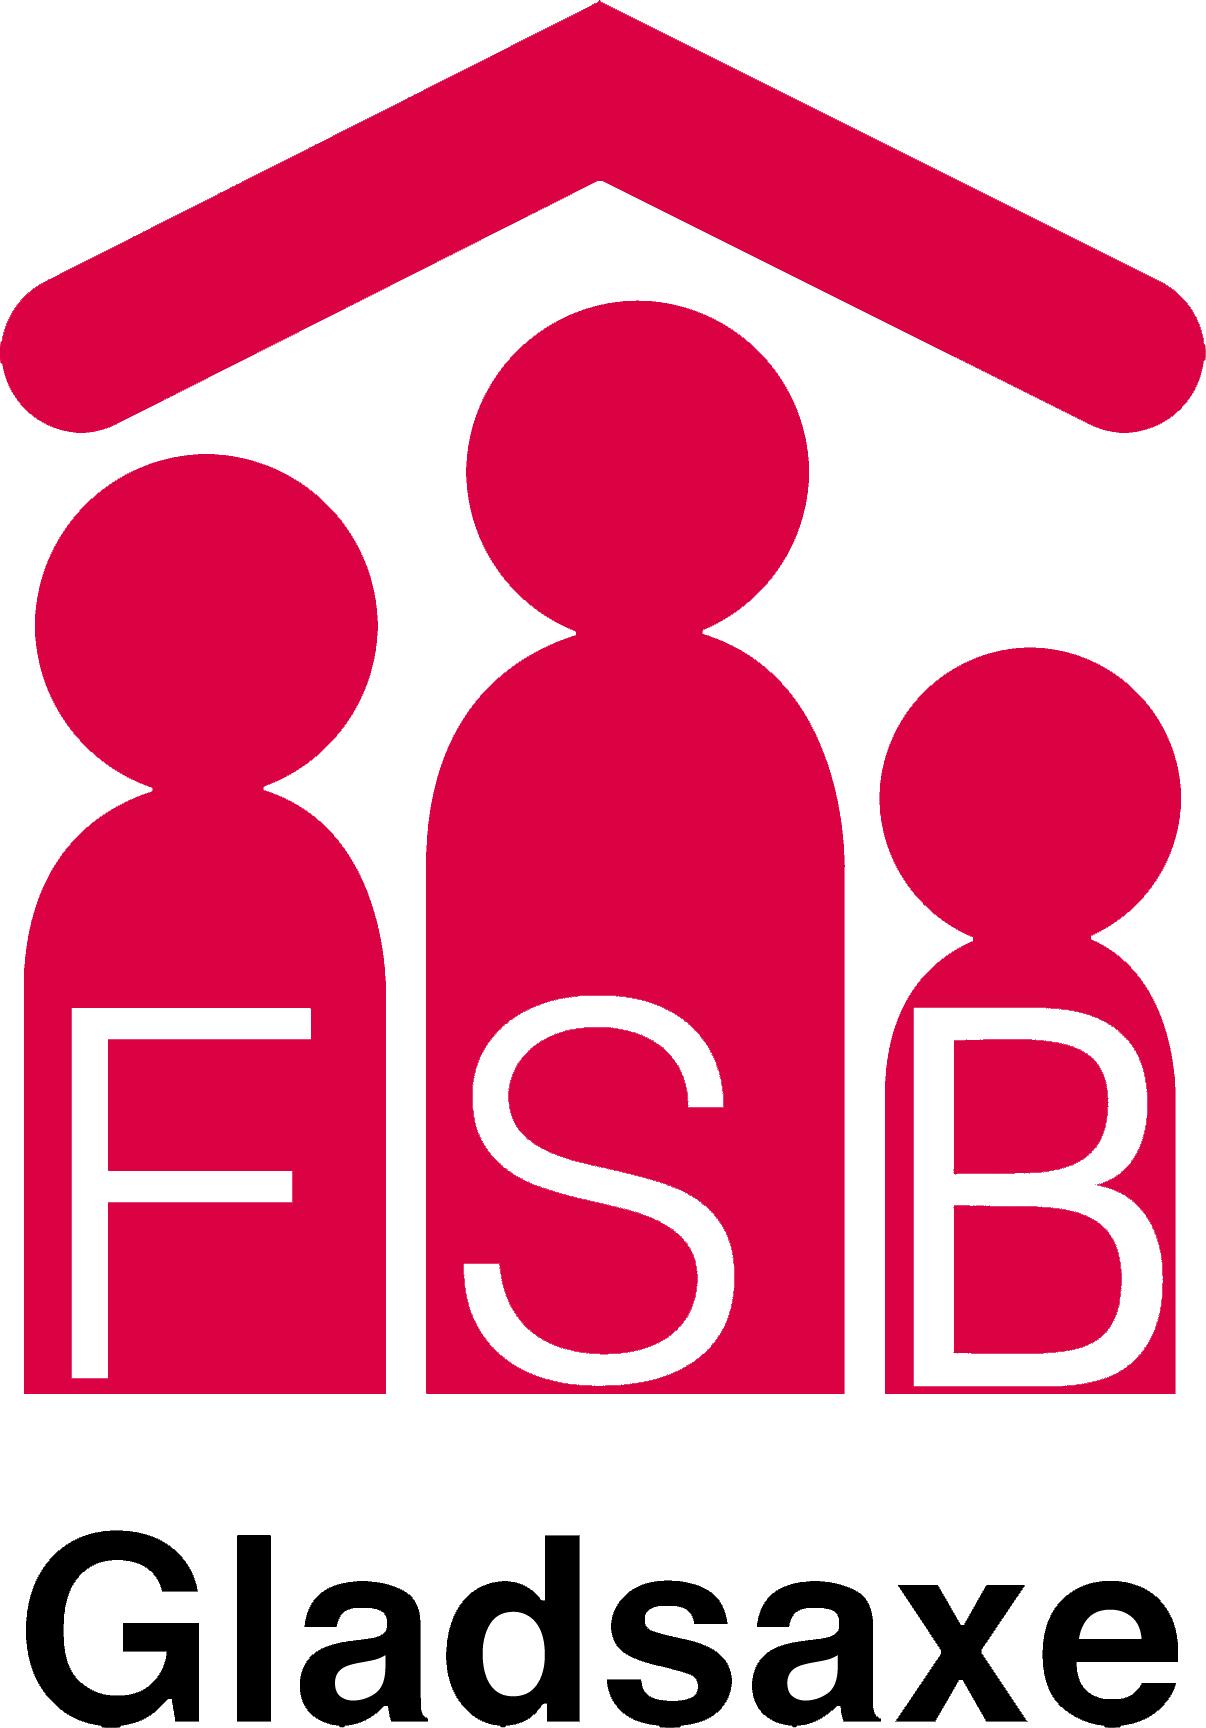 FSB_Gladsaxe trans.png